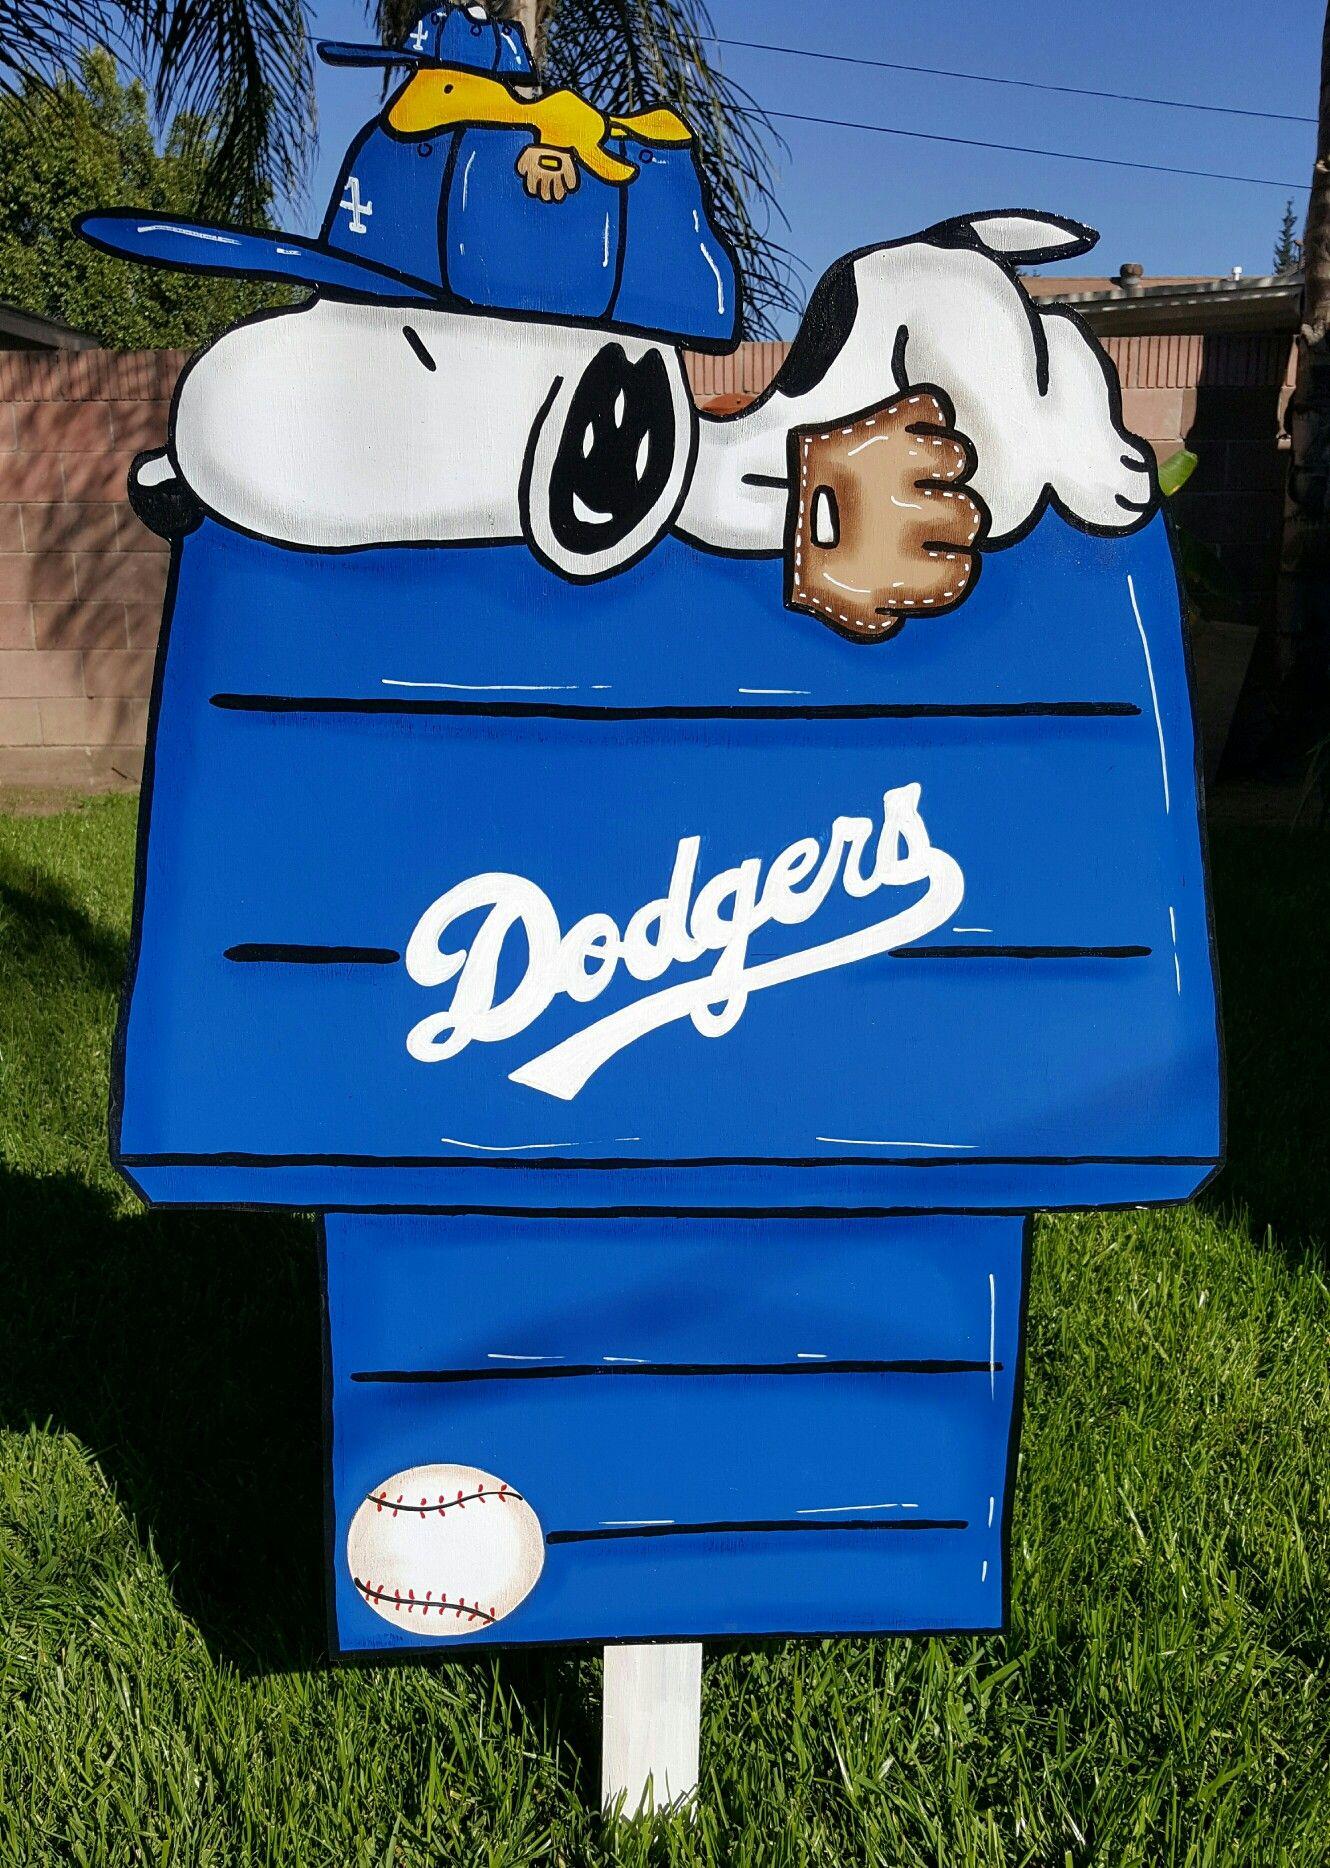 Dodgers Lawn Sign Dodgers girl, La dodgers baseball